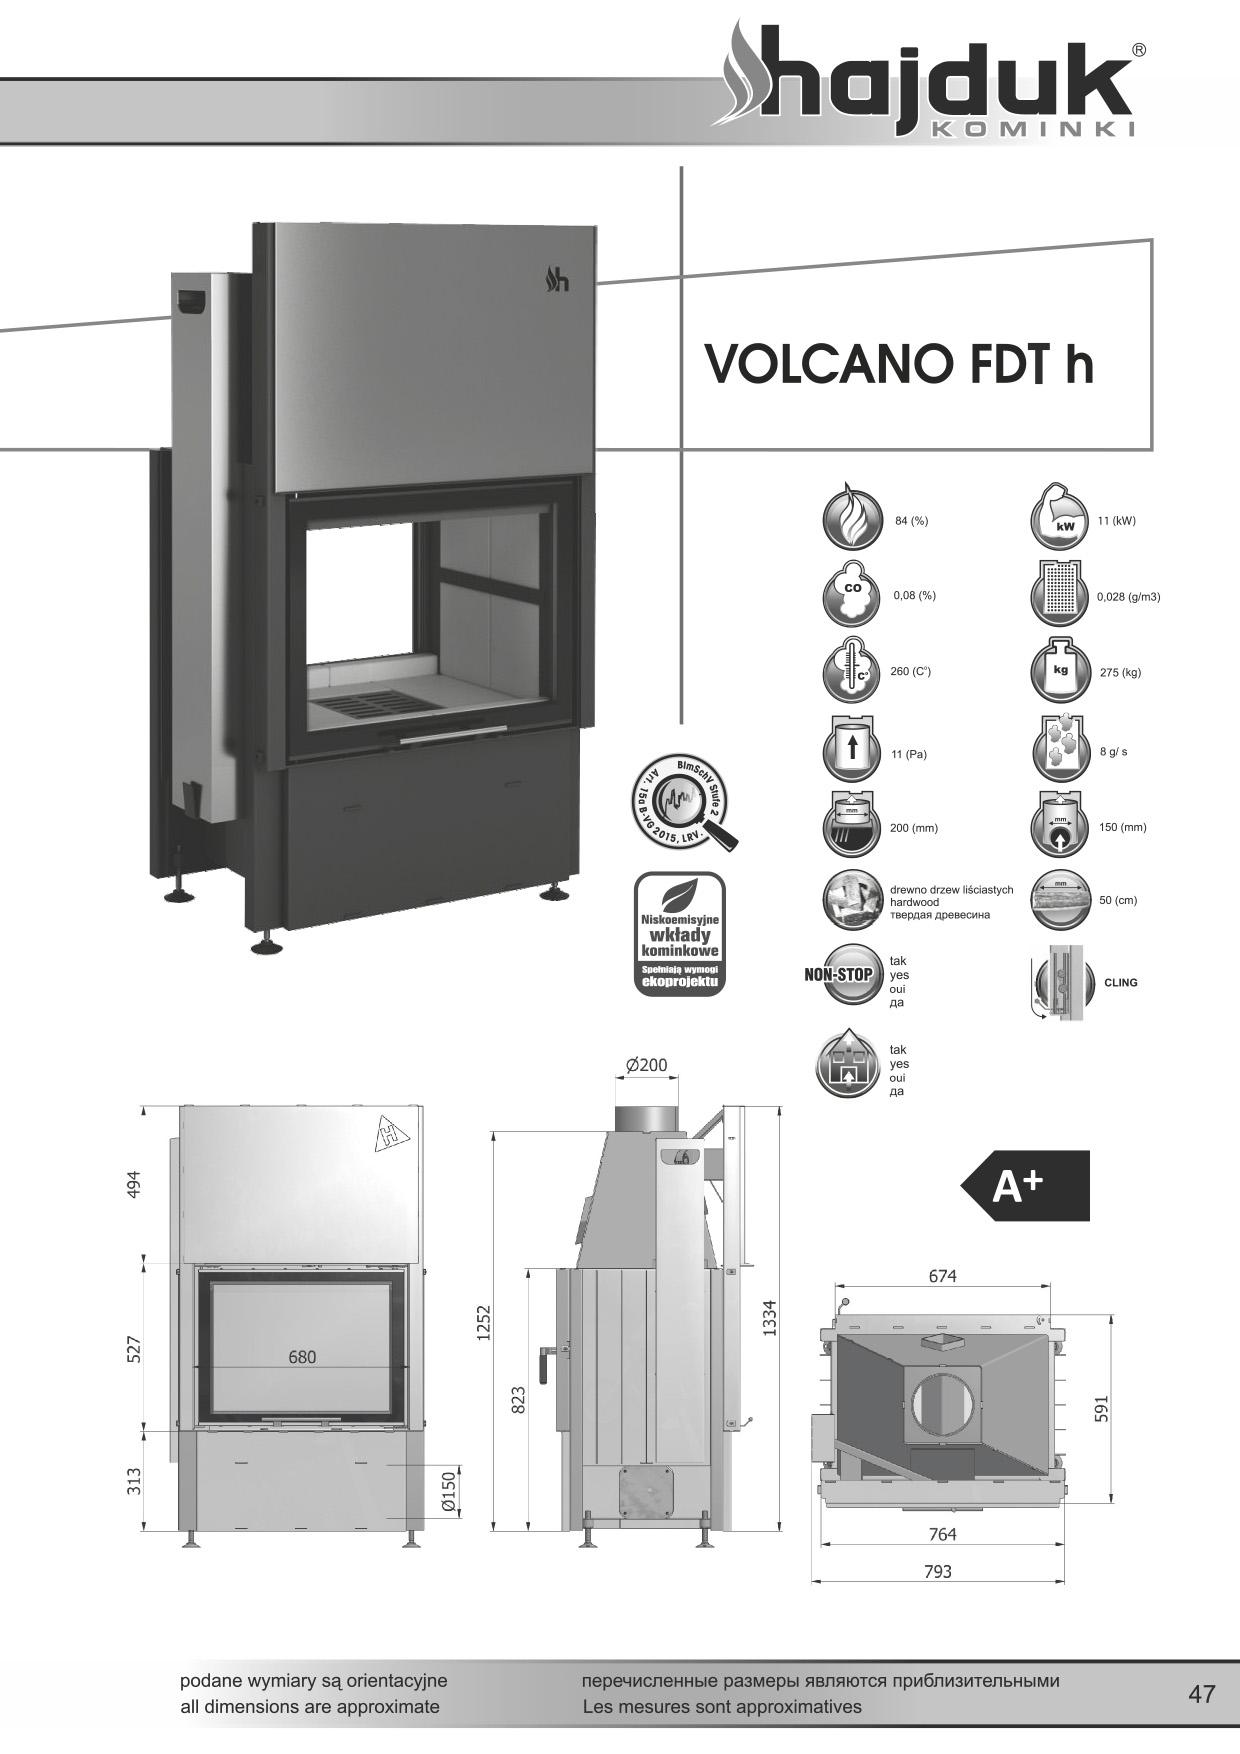 Volcano%20FDTh%20 %20karta%20techniczna - Fireplace insert Hajduk Volcano FDTh  - frameless door